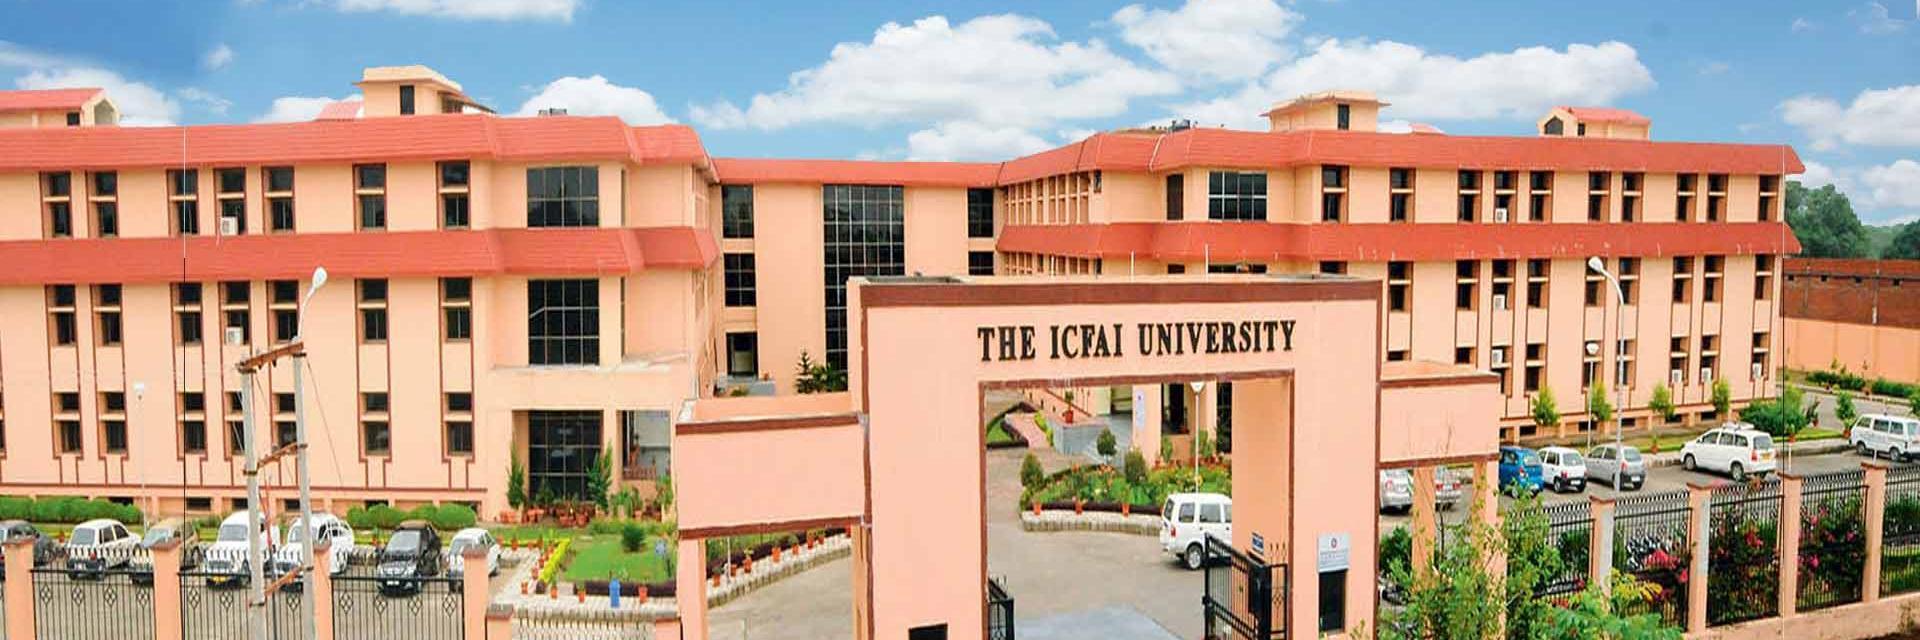 ICFAI University, Dehradun's official Twitter account